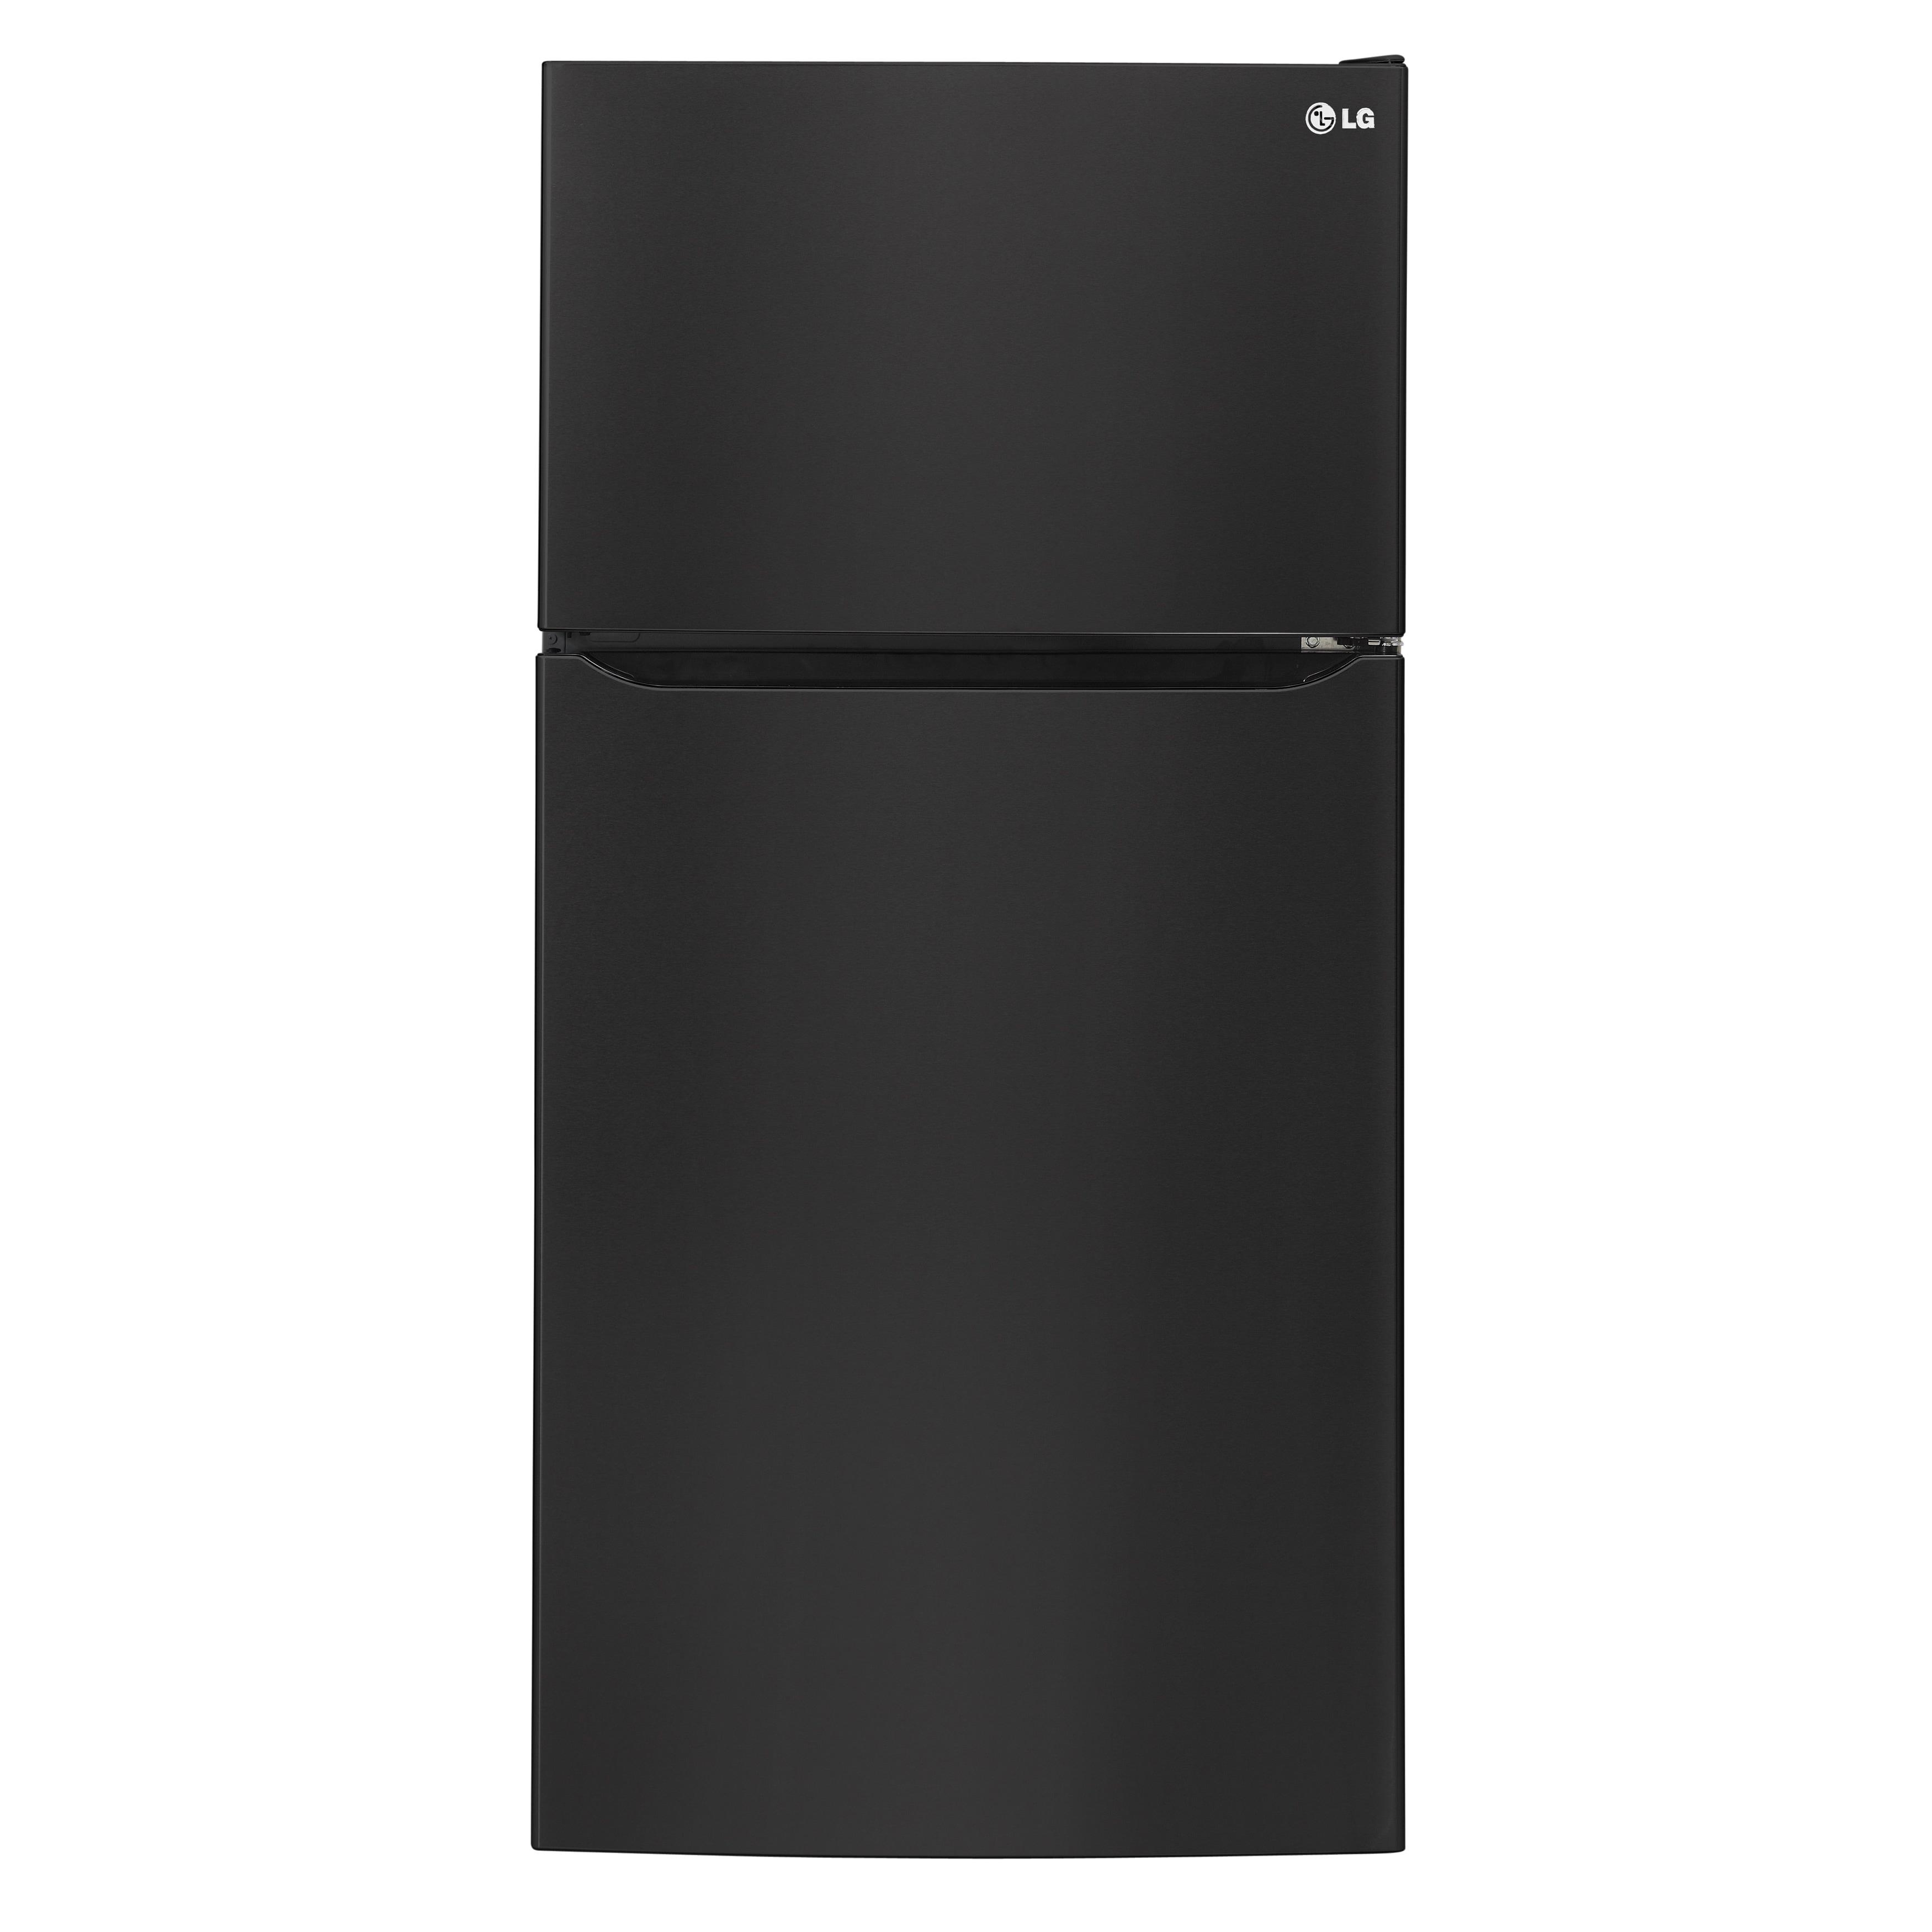 LG 33-inch Top-Freezer Refrigerator (Black) (Stainless St...